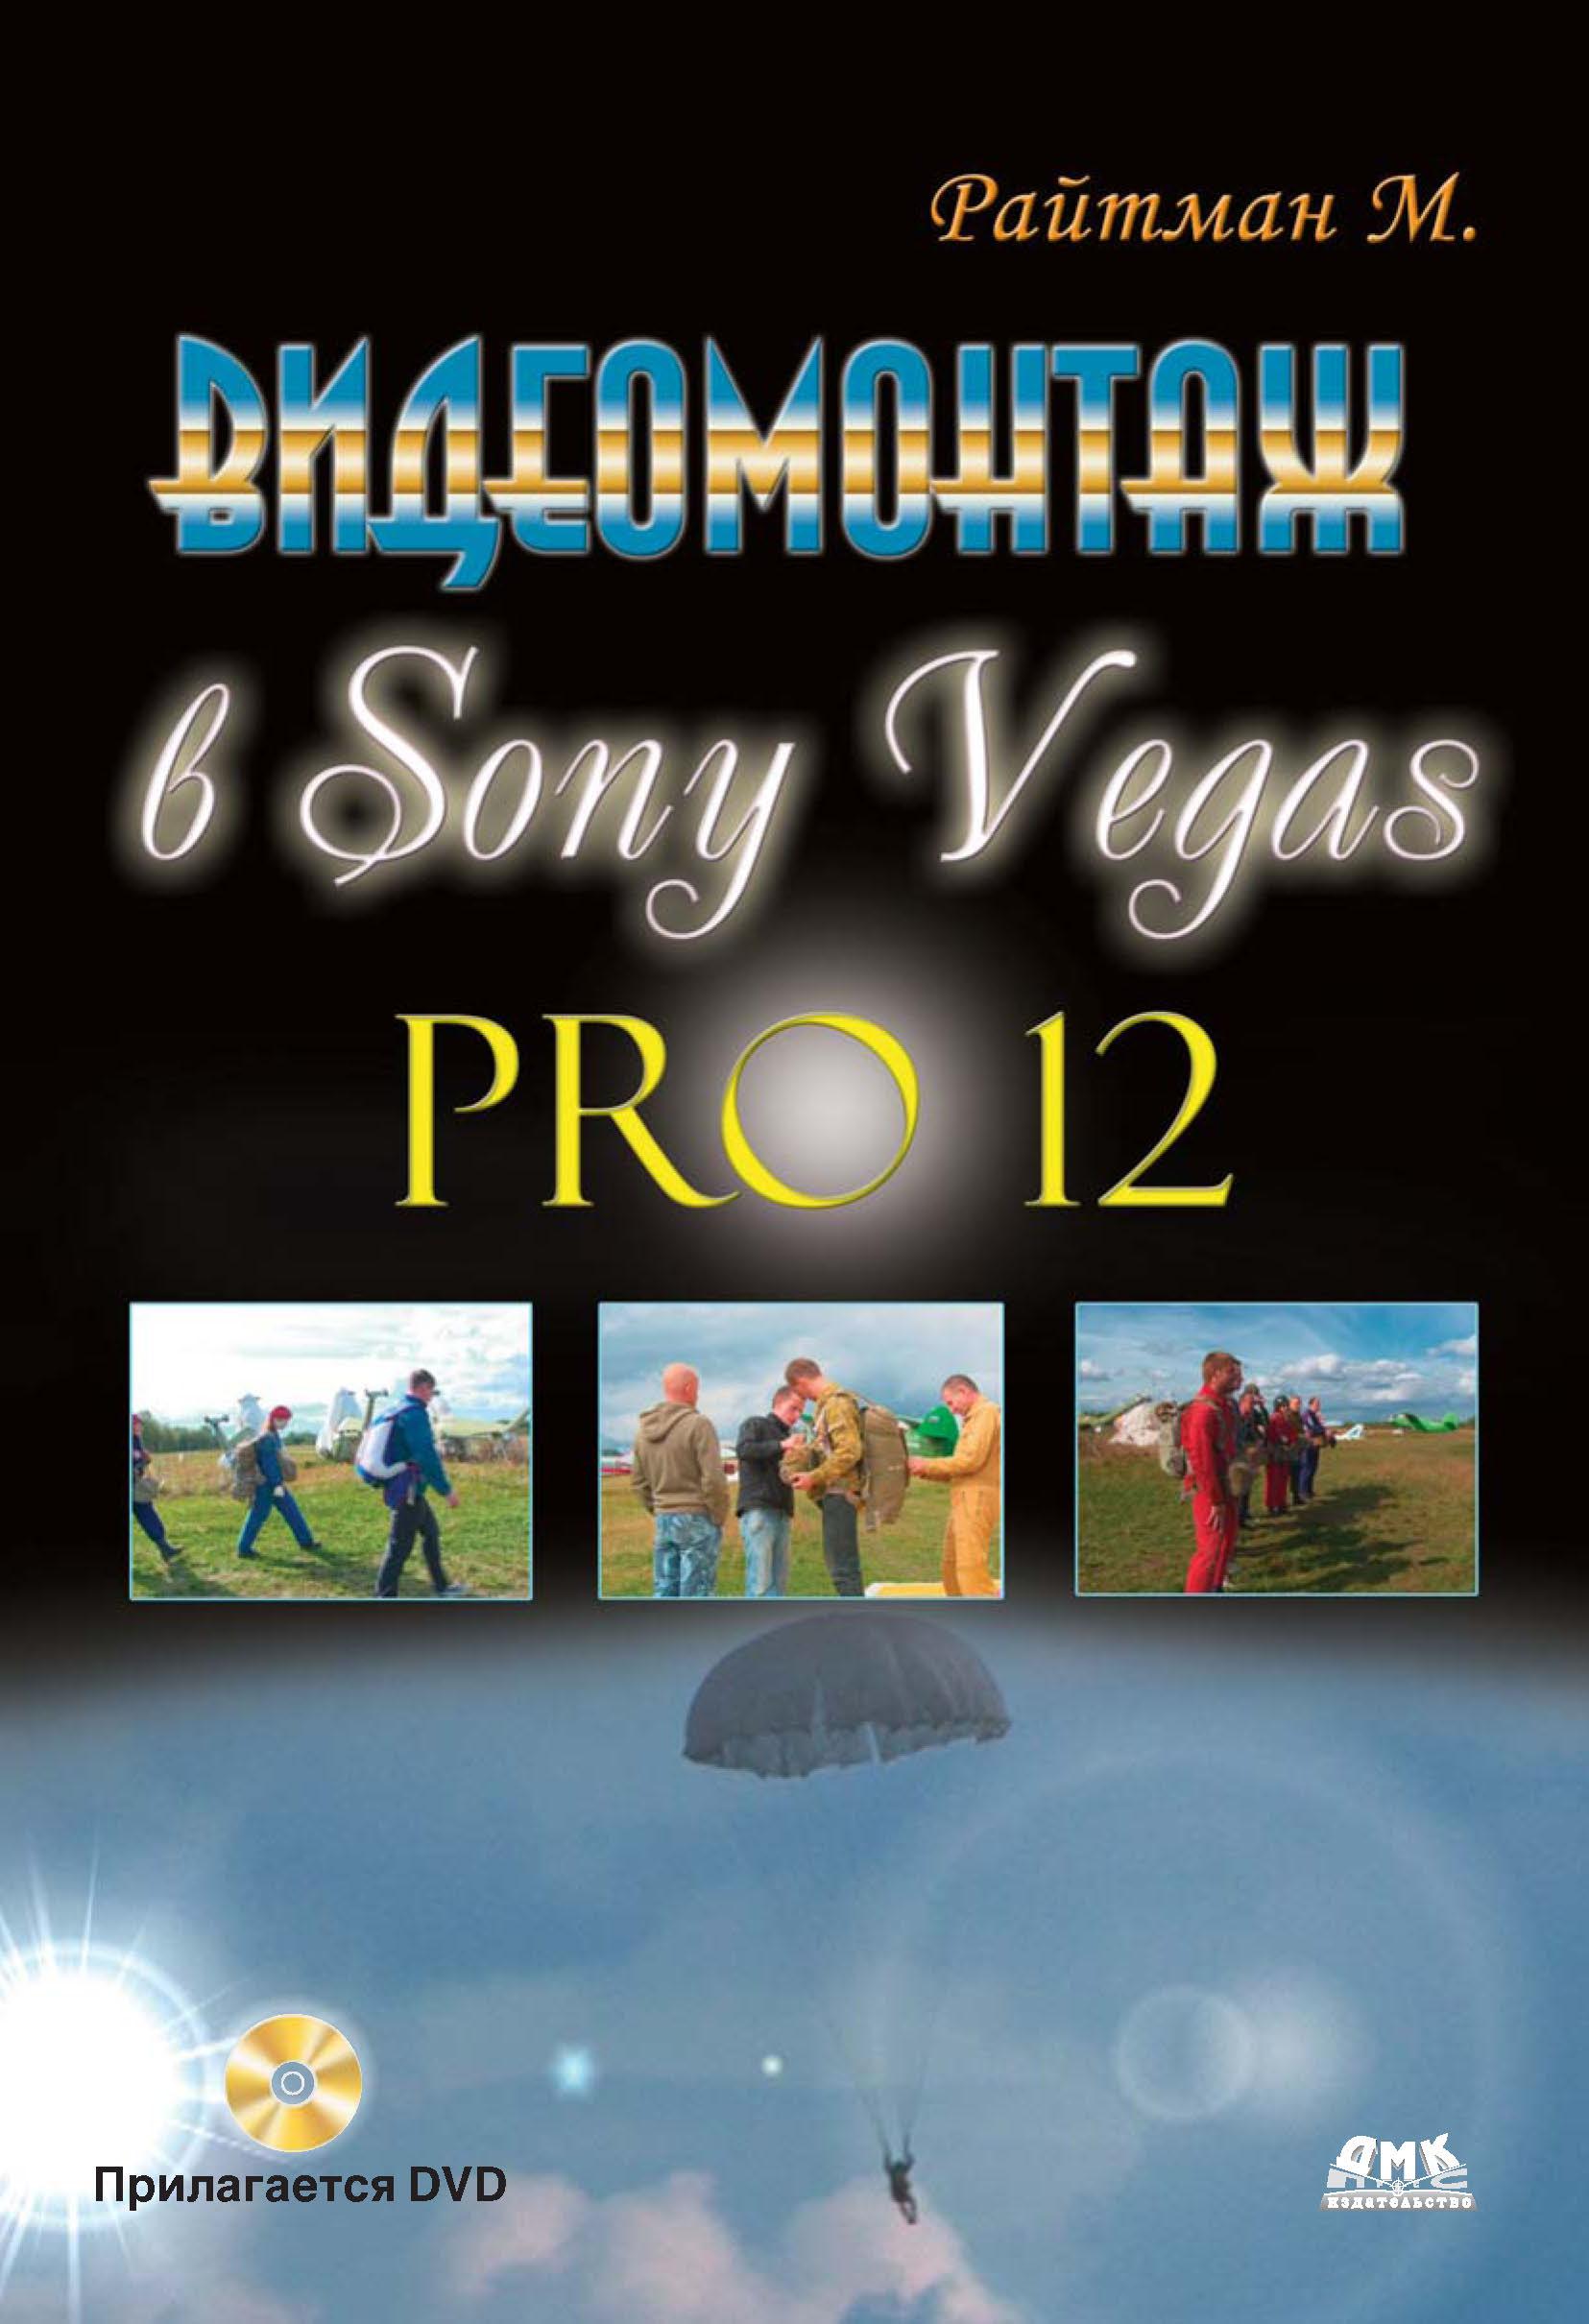 Видеомонтаж в Sony Vegas Pro 12